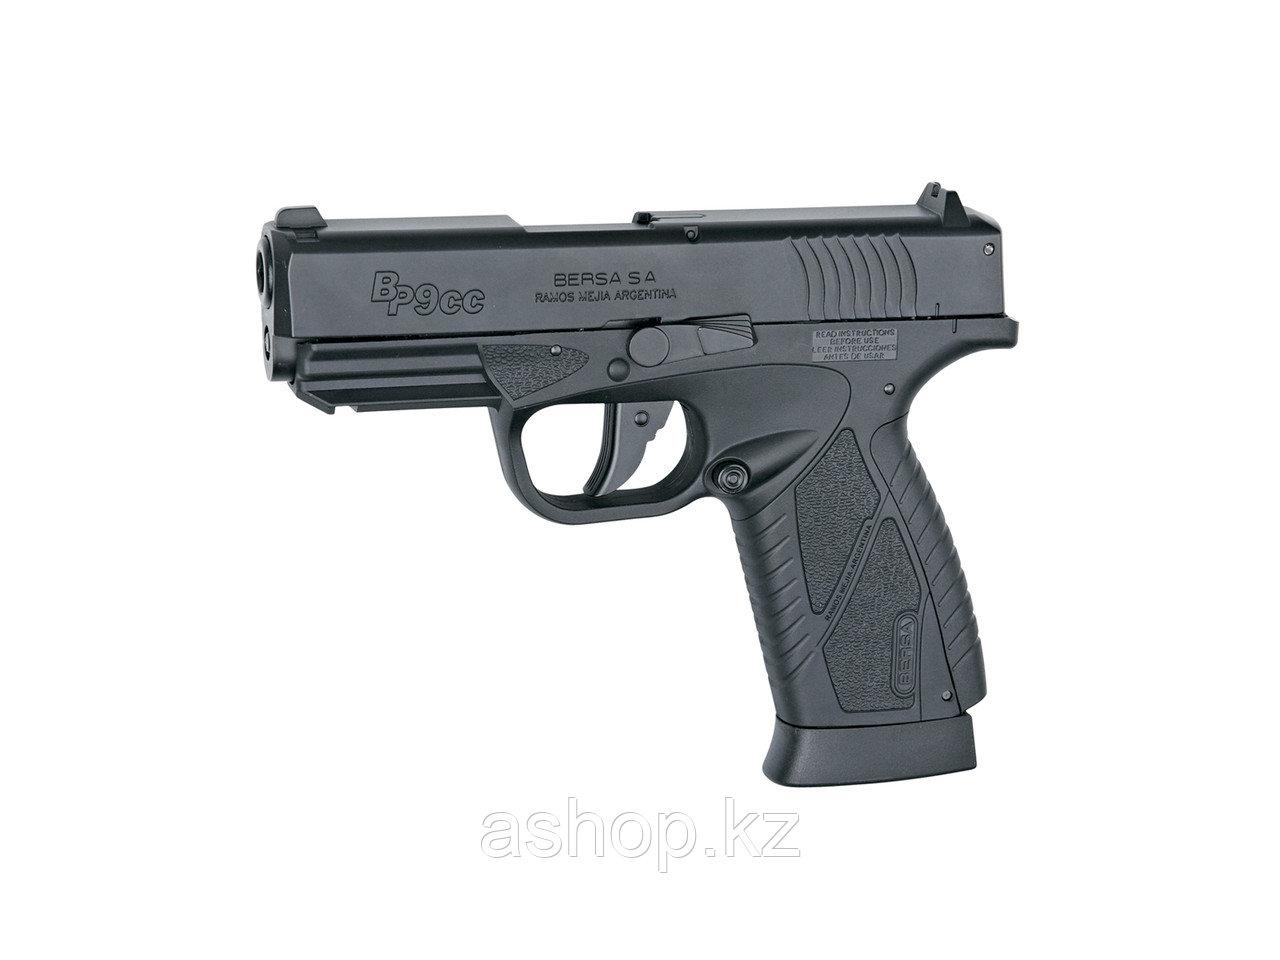 Пистолет для страйкбола ASG BERSA BP9CC, Калибр: 4,5 мм (.177, BB), Дульная энергия: 1,6 Дж, Ёмкость магазина